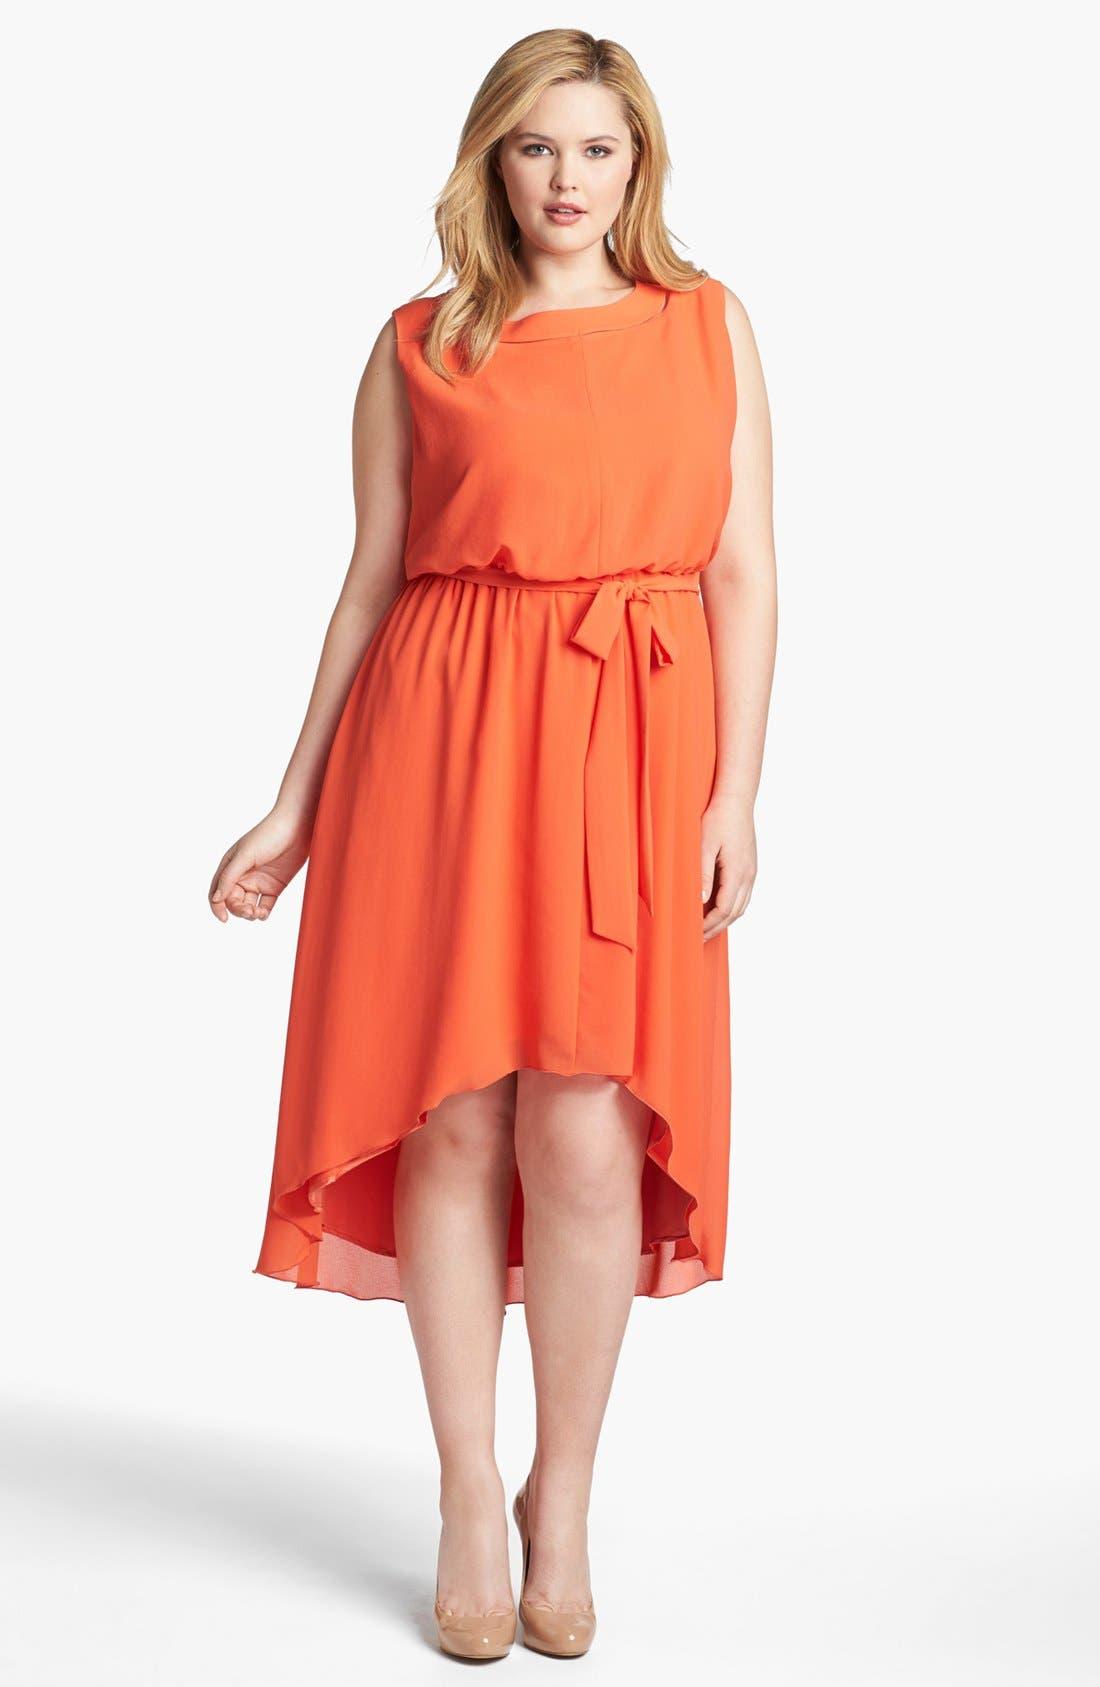 Alternate Image 1 Selected - Jessica Simpson Blouson High/Low Crepe Dress (Plus Size)